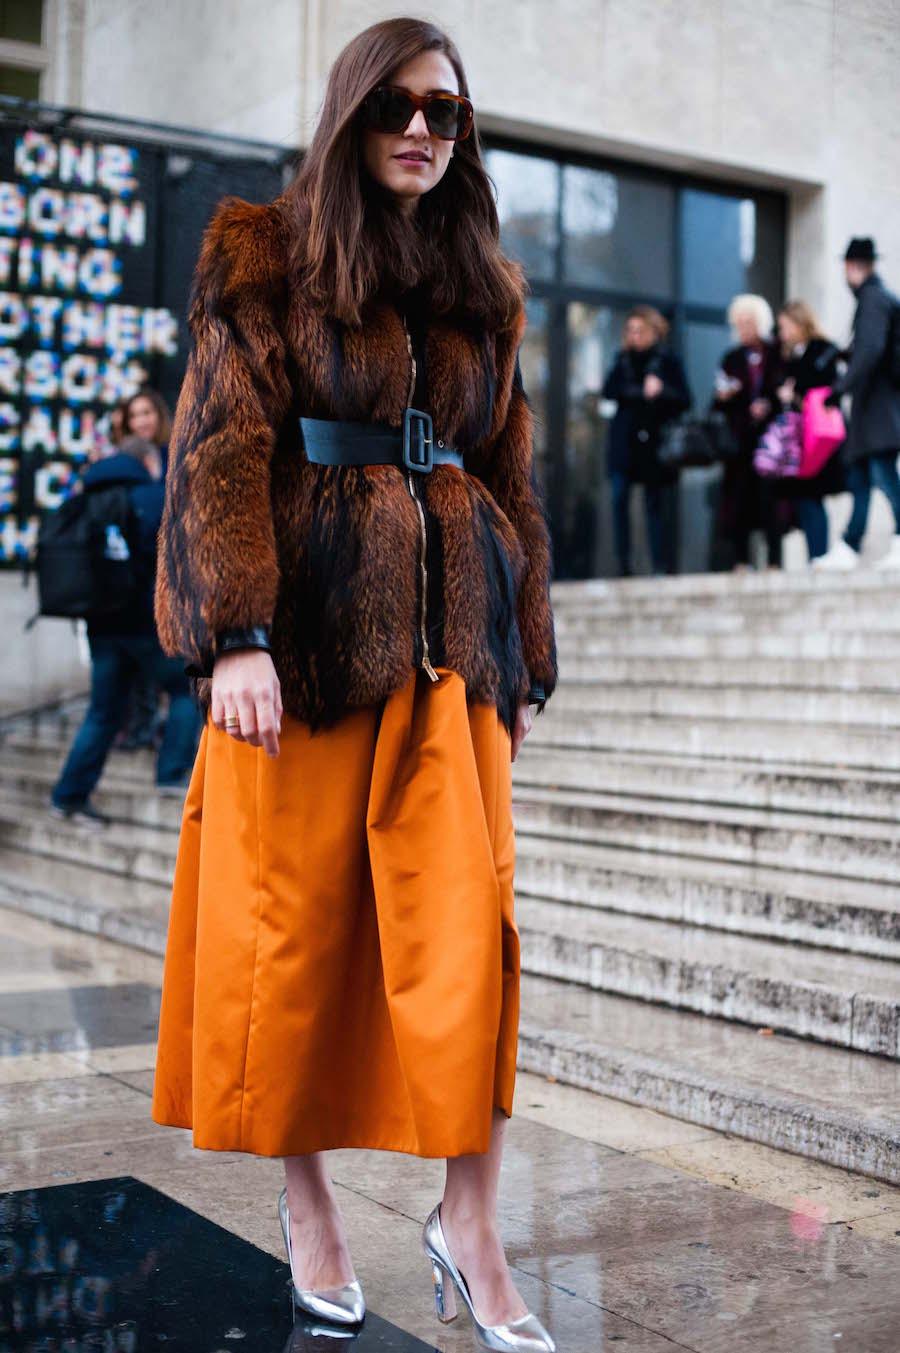 Paris Fashion Week Street Style 2016-8